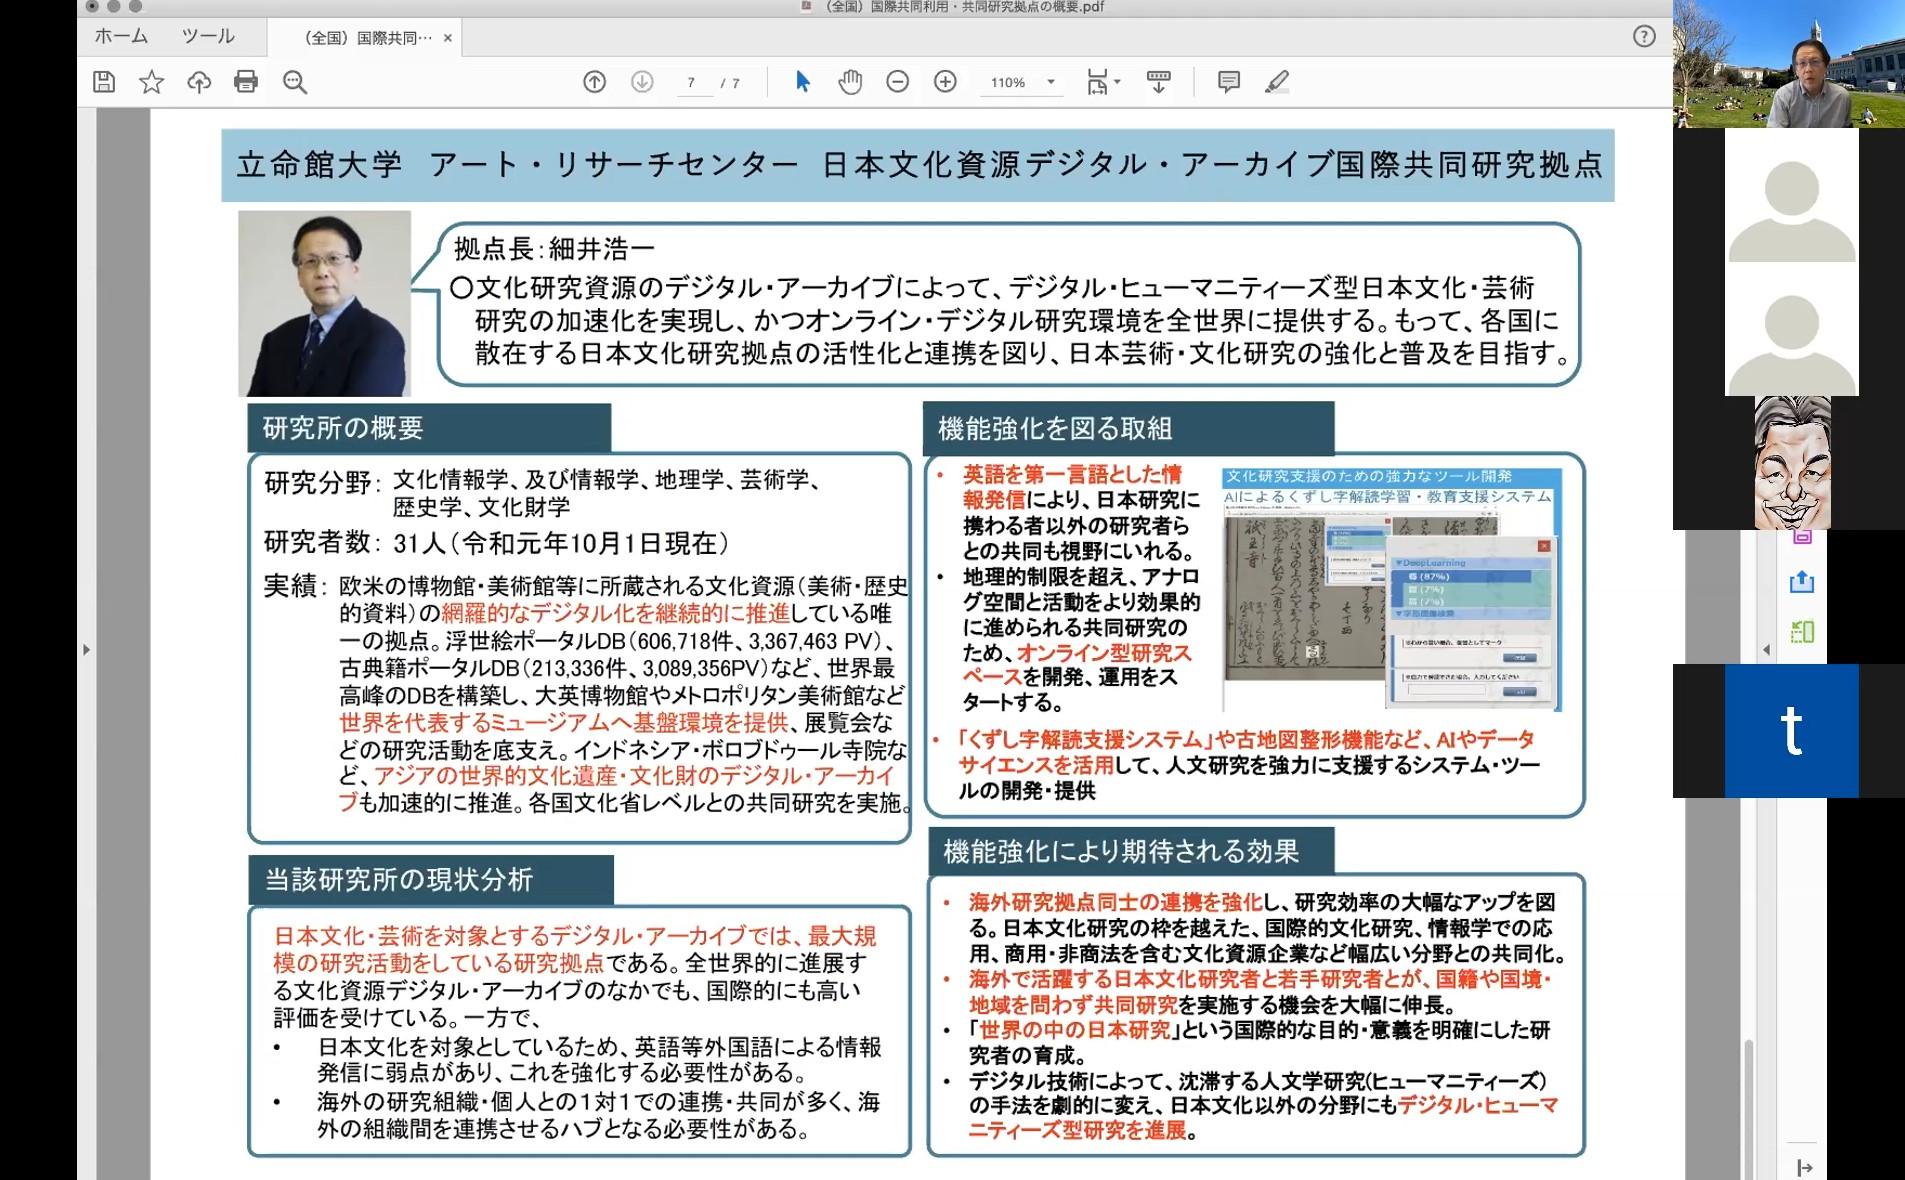 https://www.arc.ritsumei.ac.jp/lib/app/newarc/news/hosoi_sensei.jpg